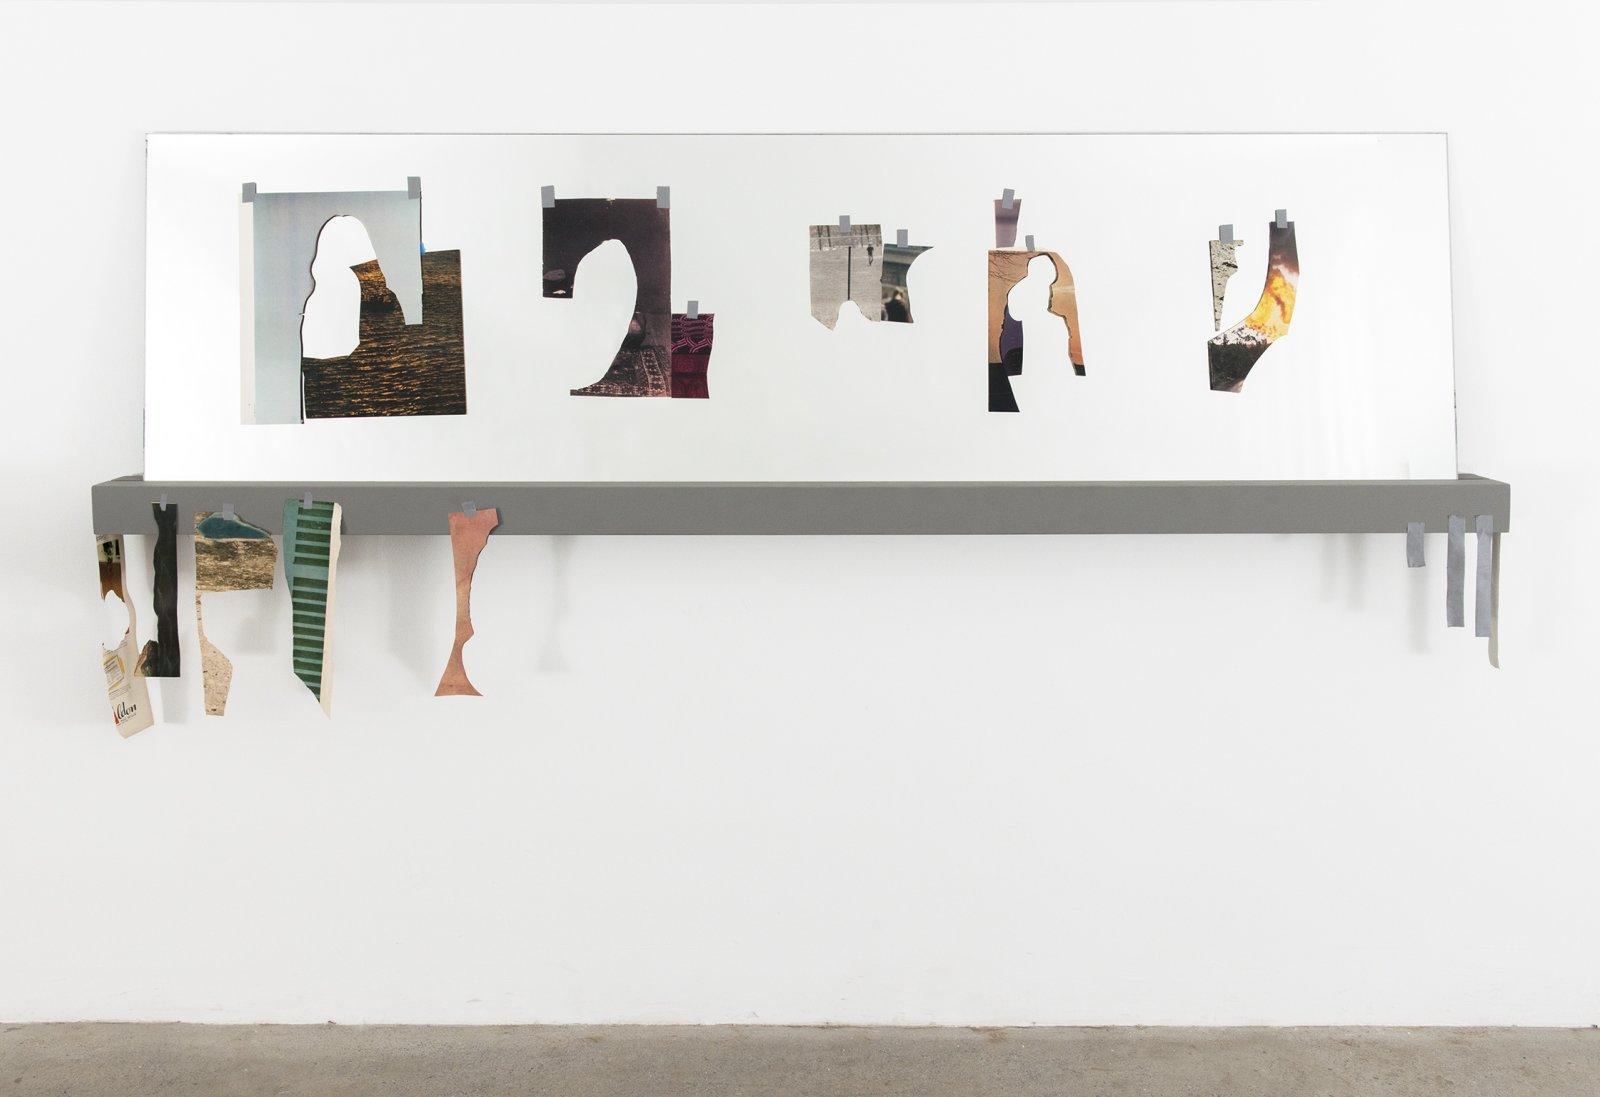 Geoffrey Farmer,Untitled, 2012, mirror,LIFEMagazinecutouts, wood shelf, tape, 23 x 76 x 5 in. (59 x 192 x 12 cm)